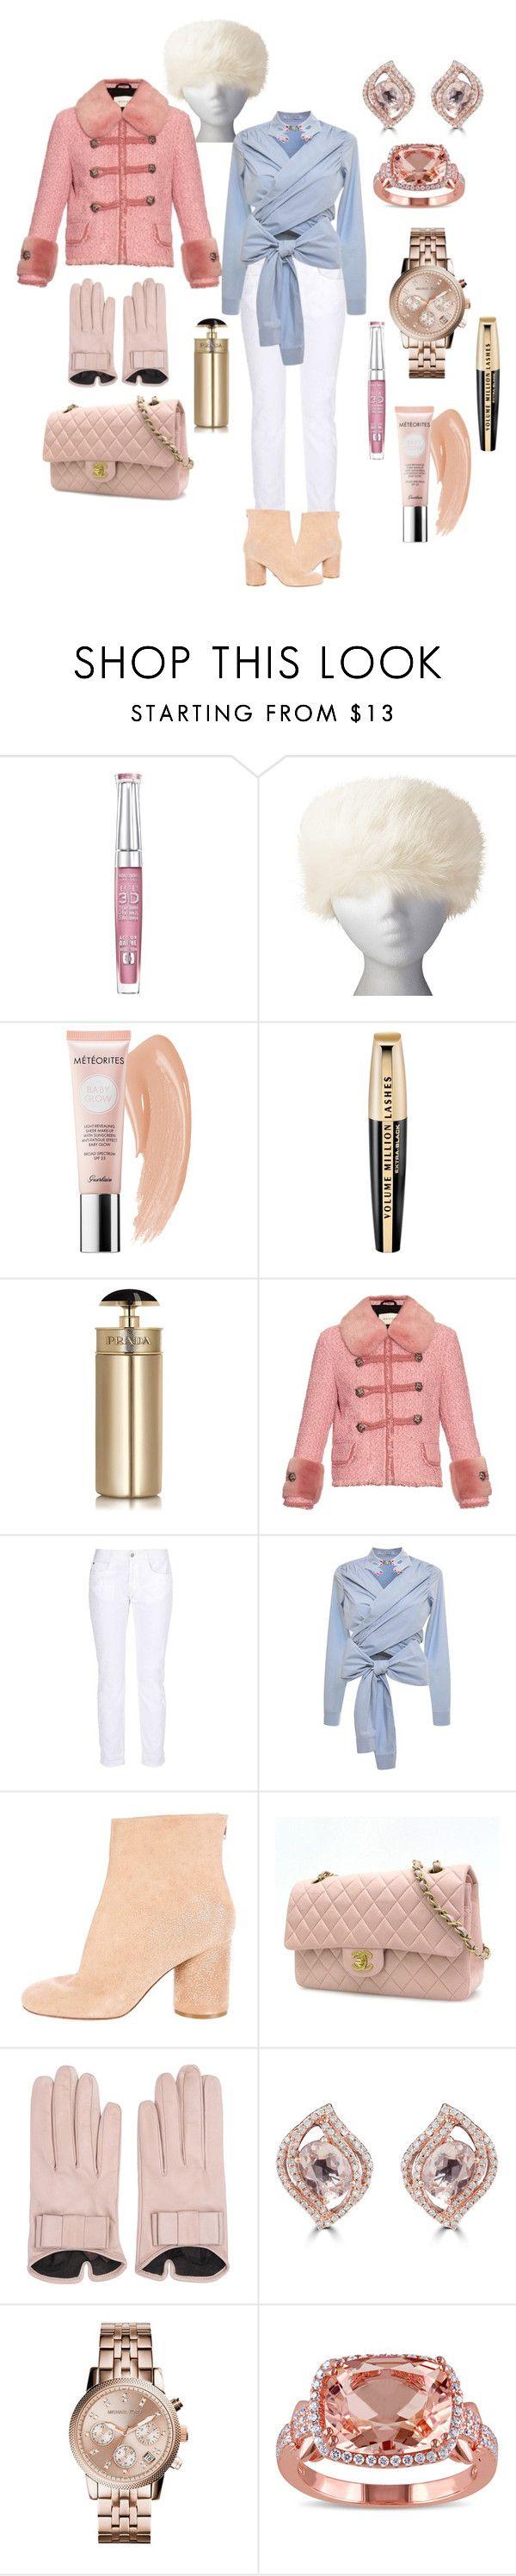 """Office Friday.  Casual Outfit"" by elena-kononenko ❤ liked on Polyvore featuring Bourjois, UGG Australia, Guerlain, L'Oréal Paris, Prada, Gucci, STELLA McCARTNEY, VIVETTA, Maison Margiela and Chanel"